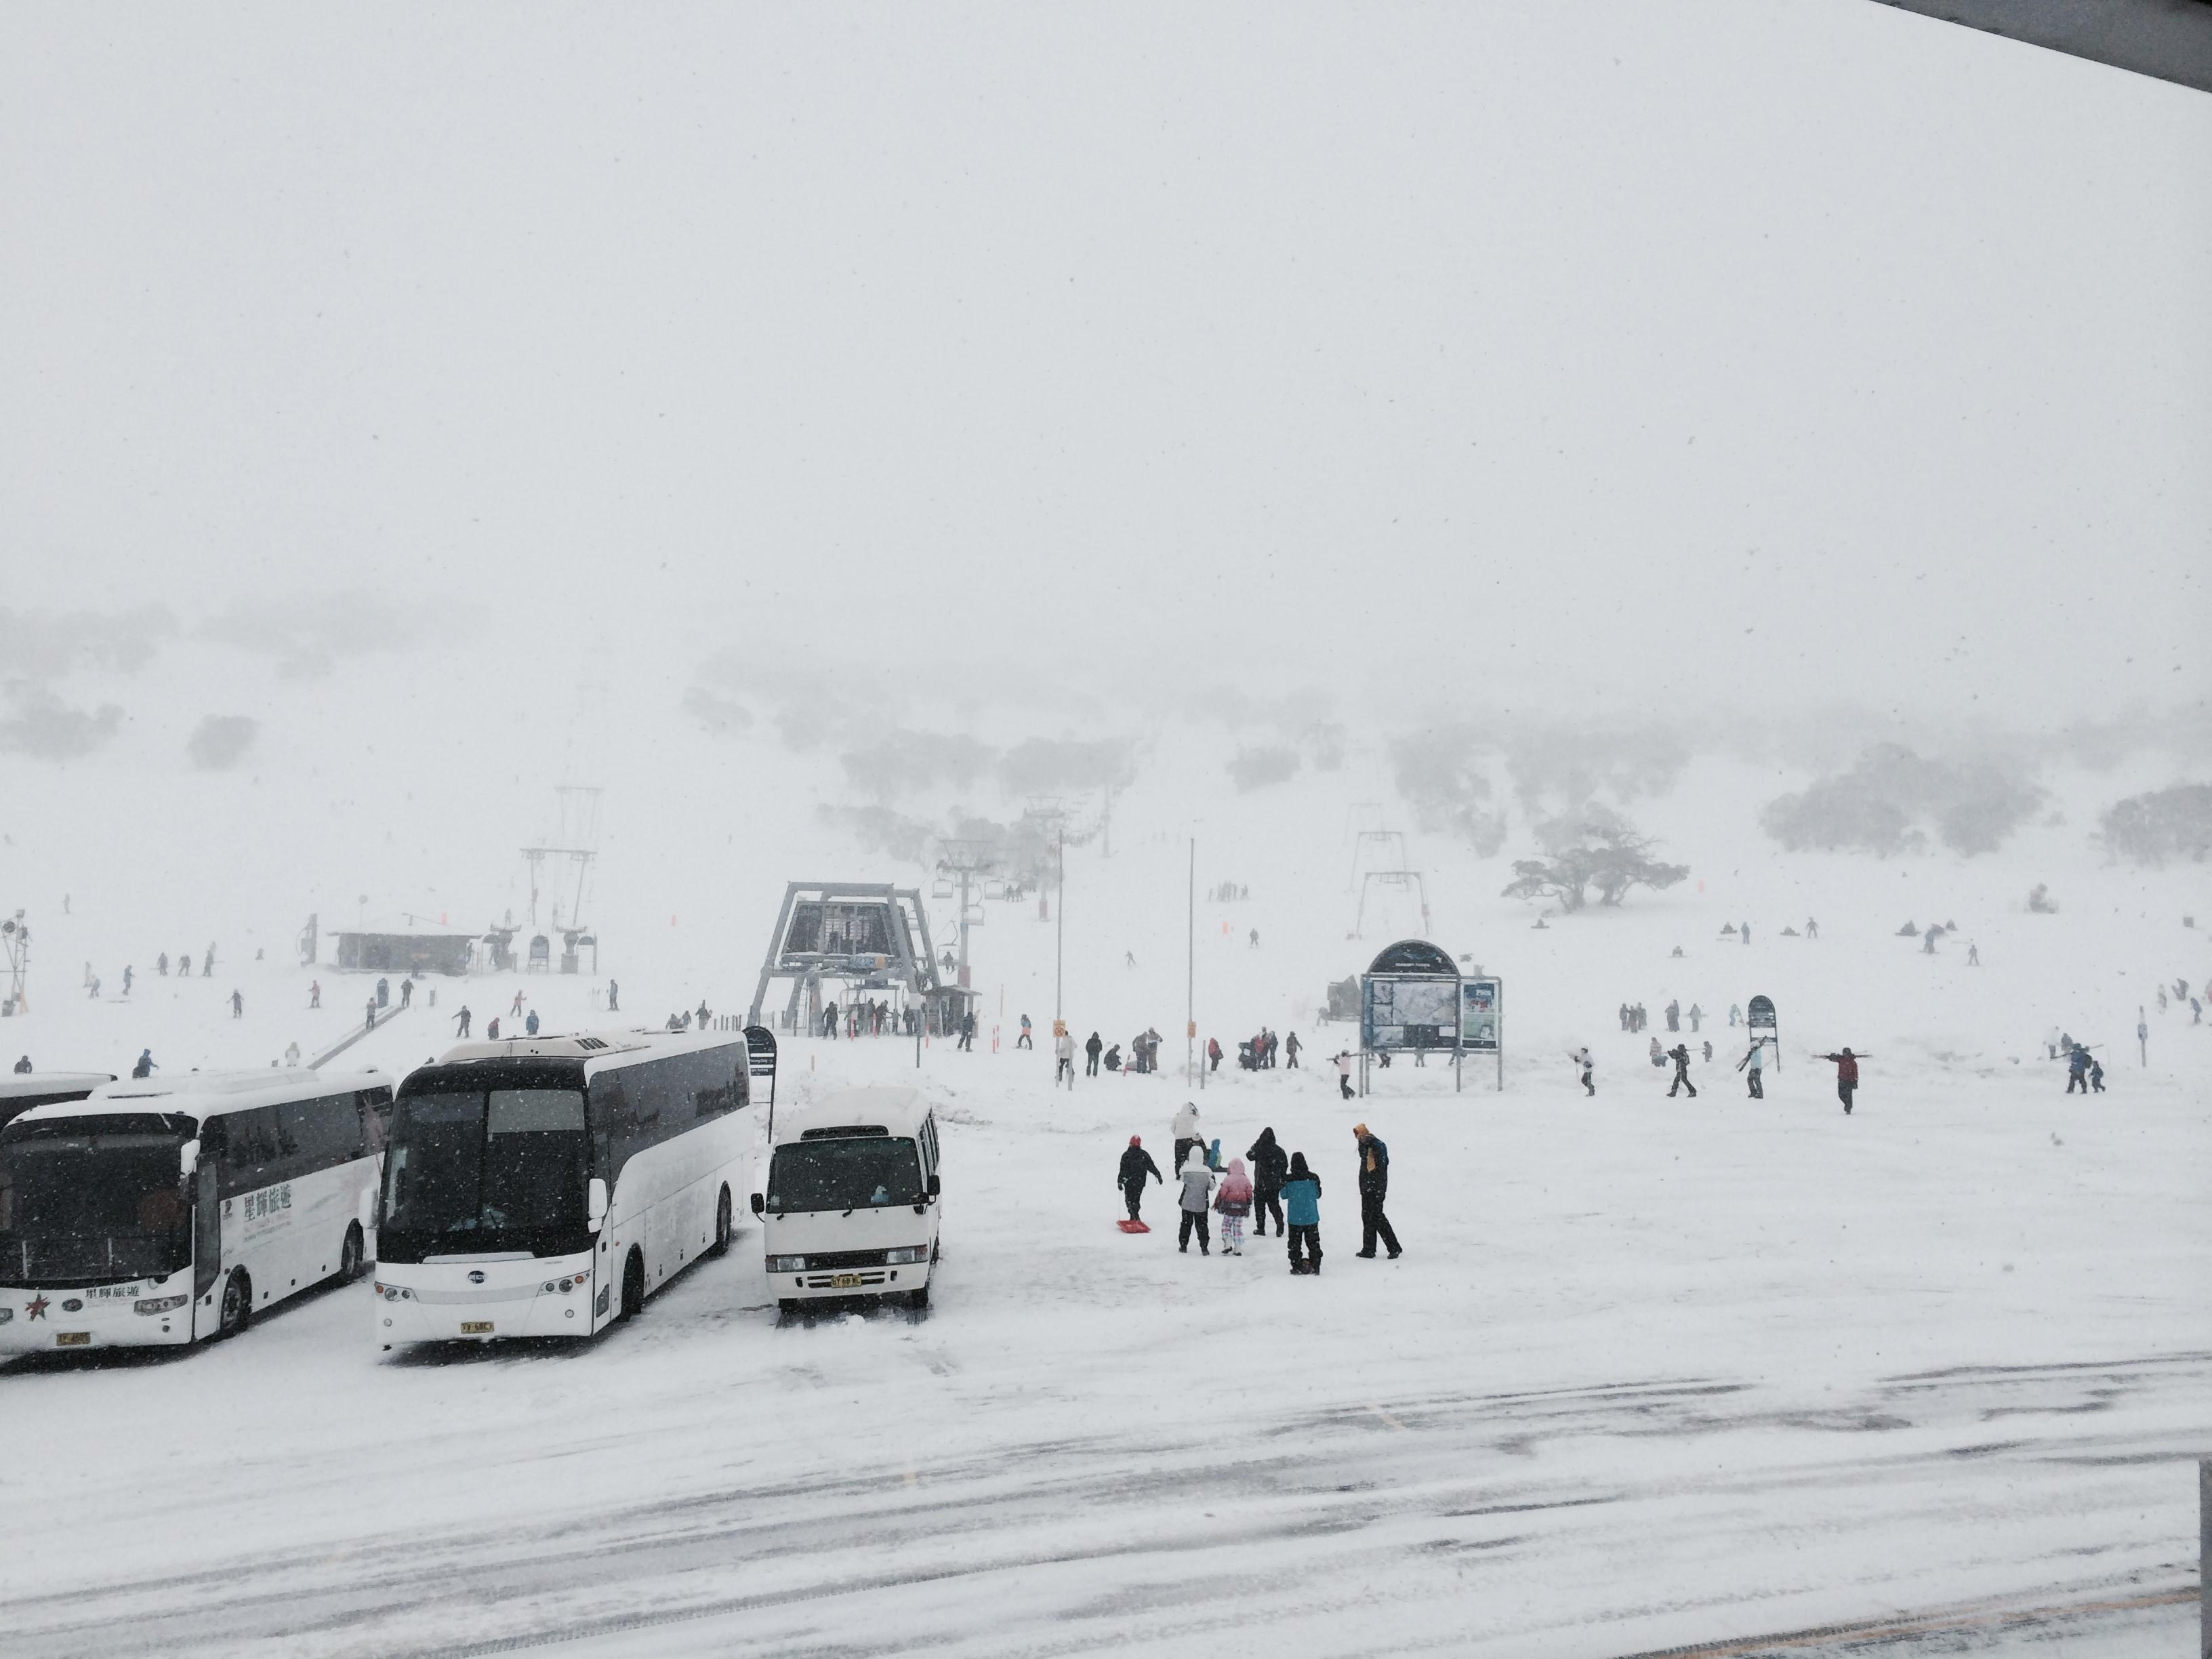 Smiggins in a Blizzard